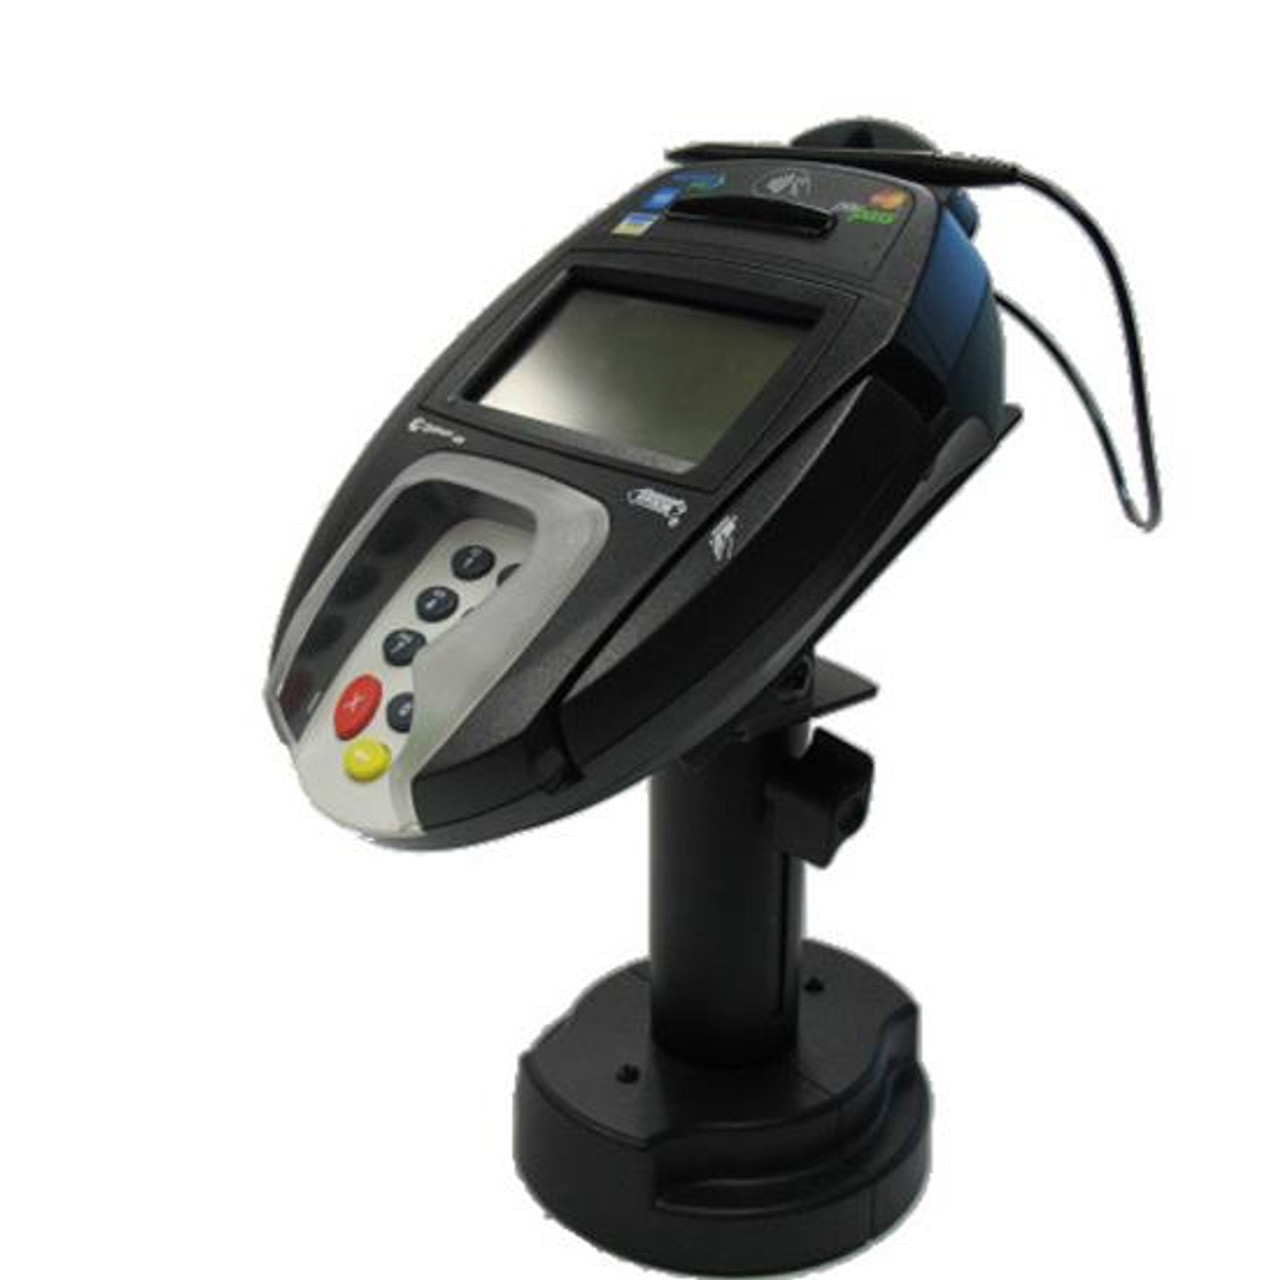 Swivel Stands Credit Card Stand Telescoping Pedestal Hypercom L4200